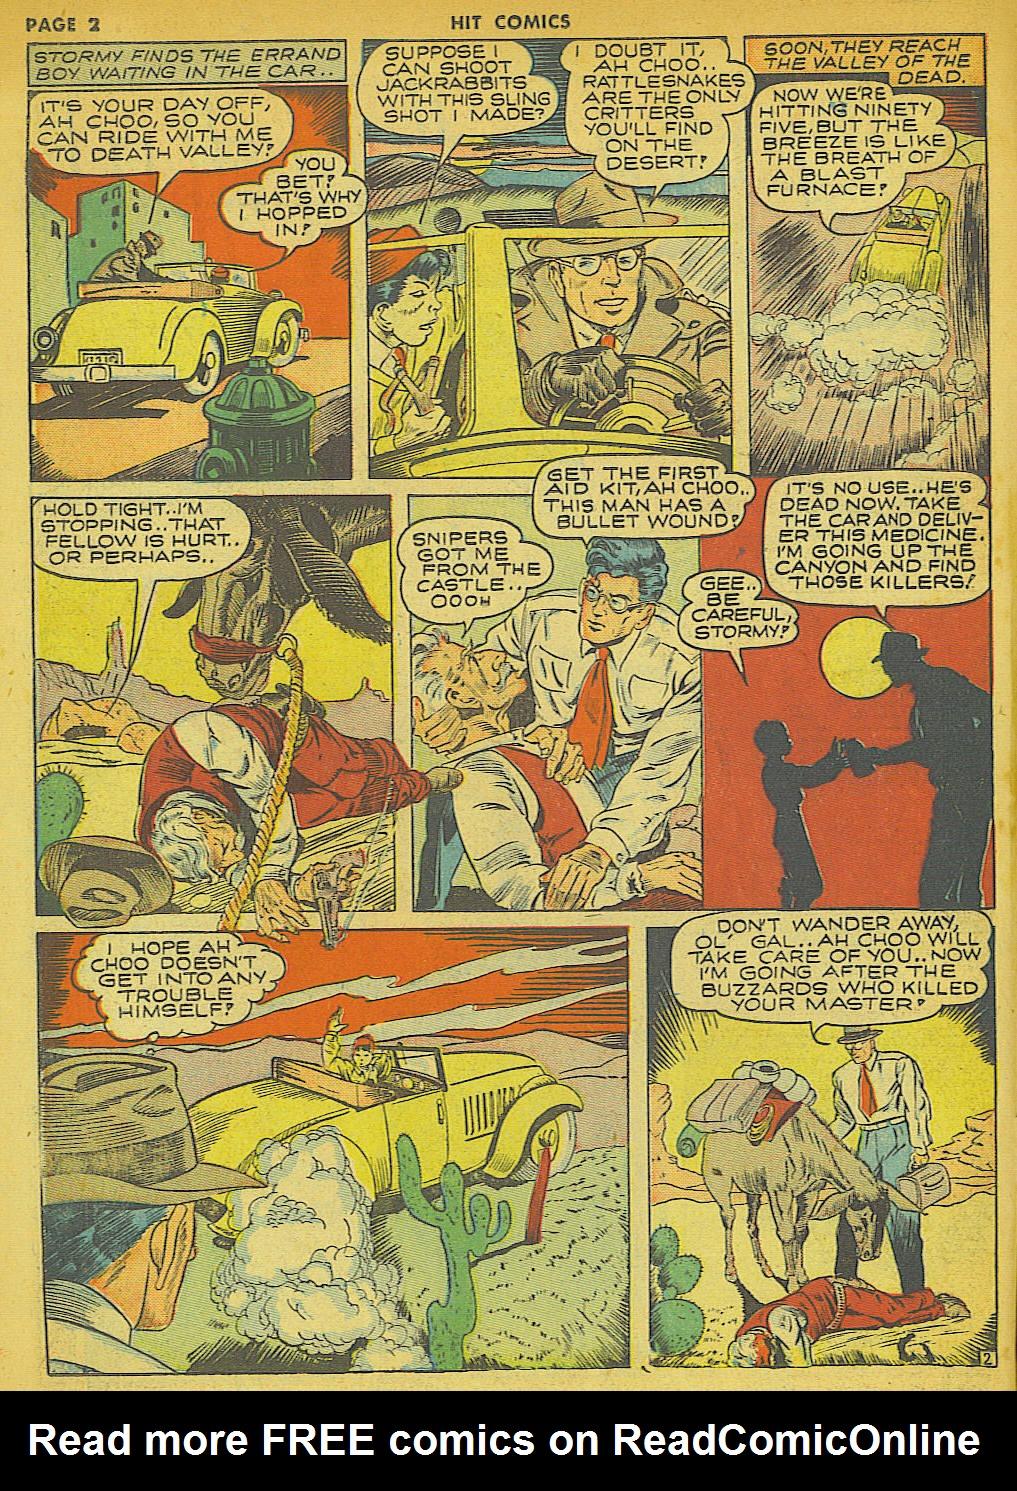 Read online Hit Comics comic -  Issue #21 - 4